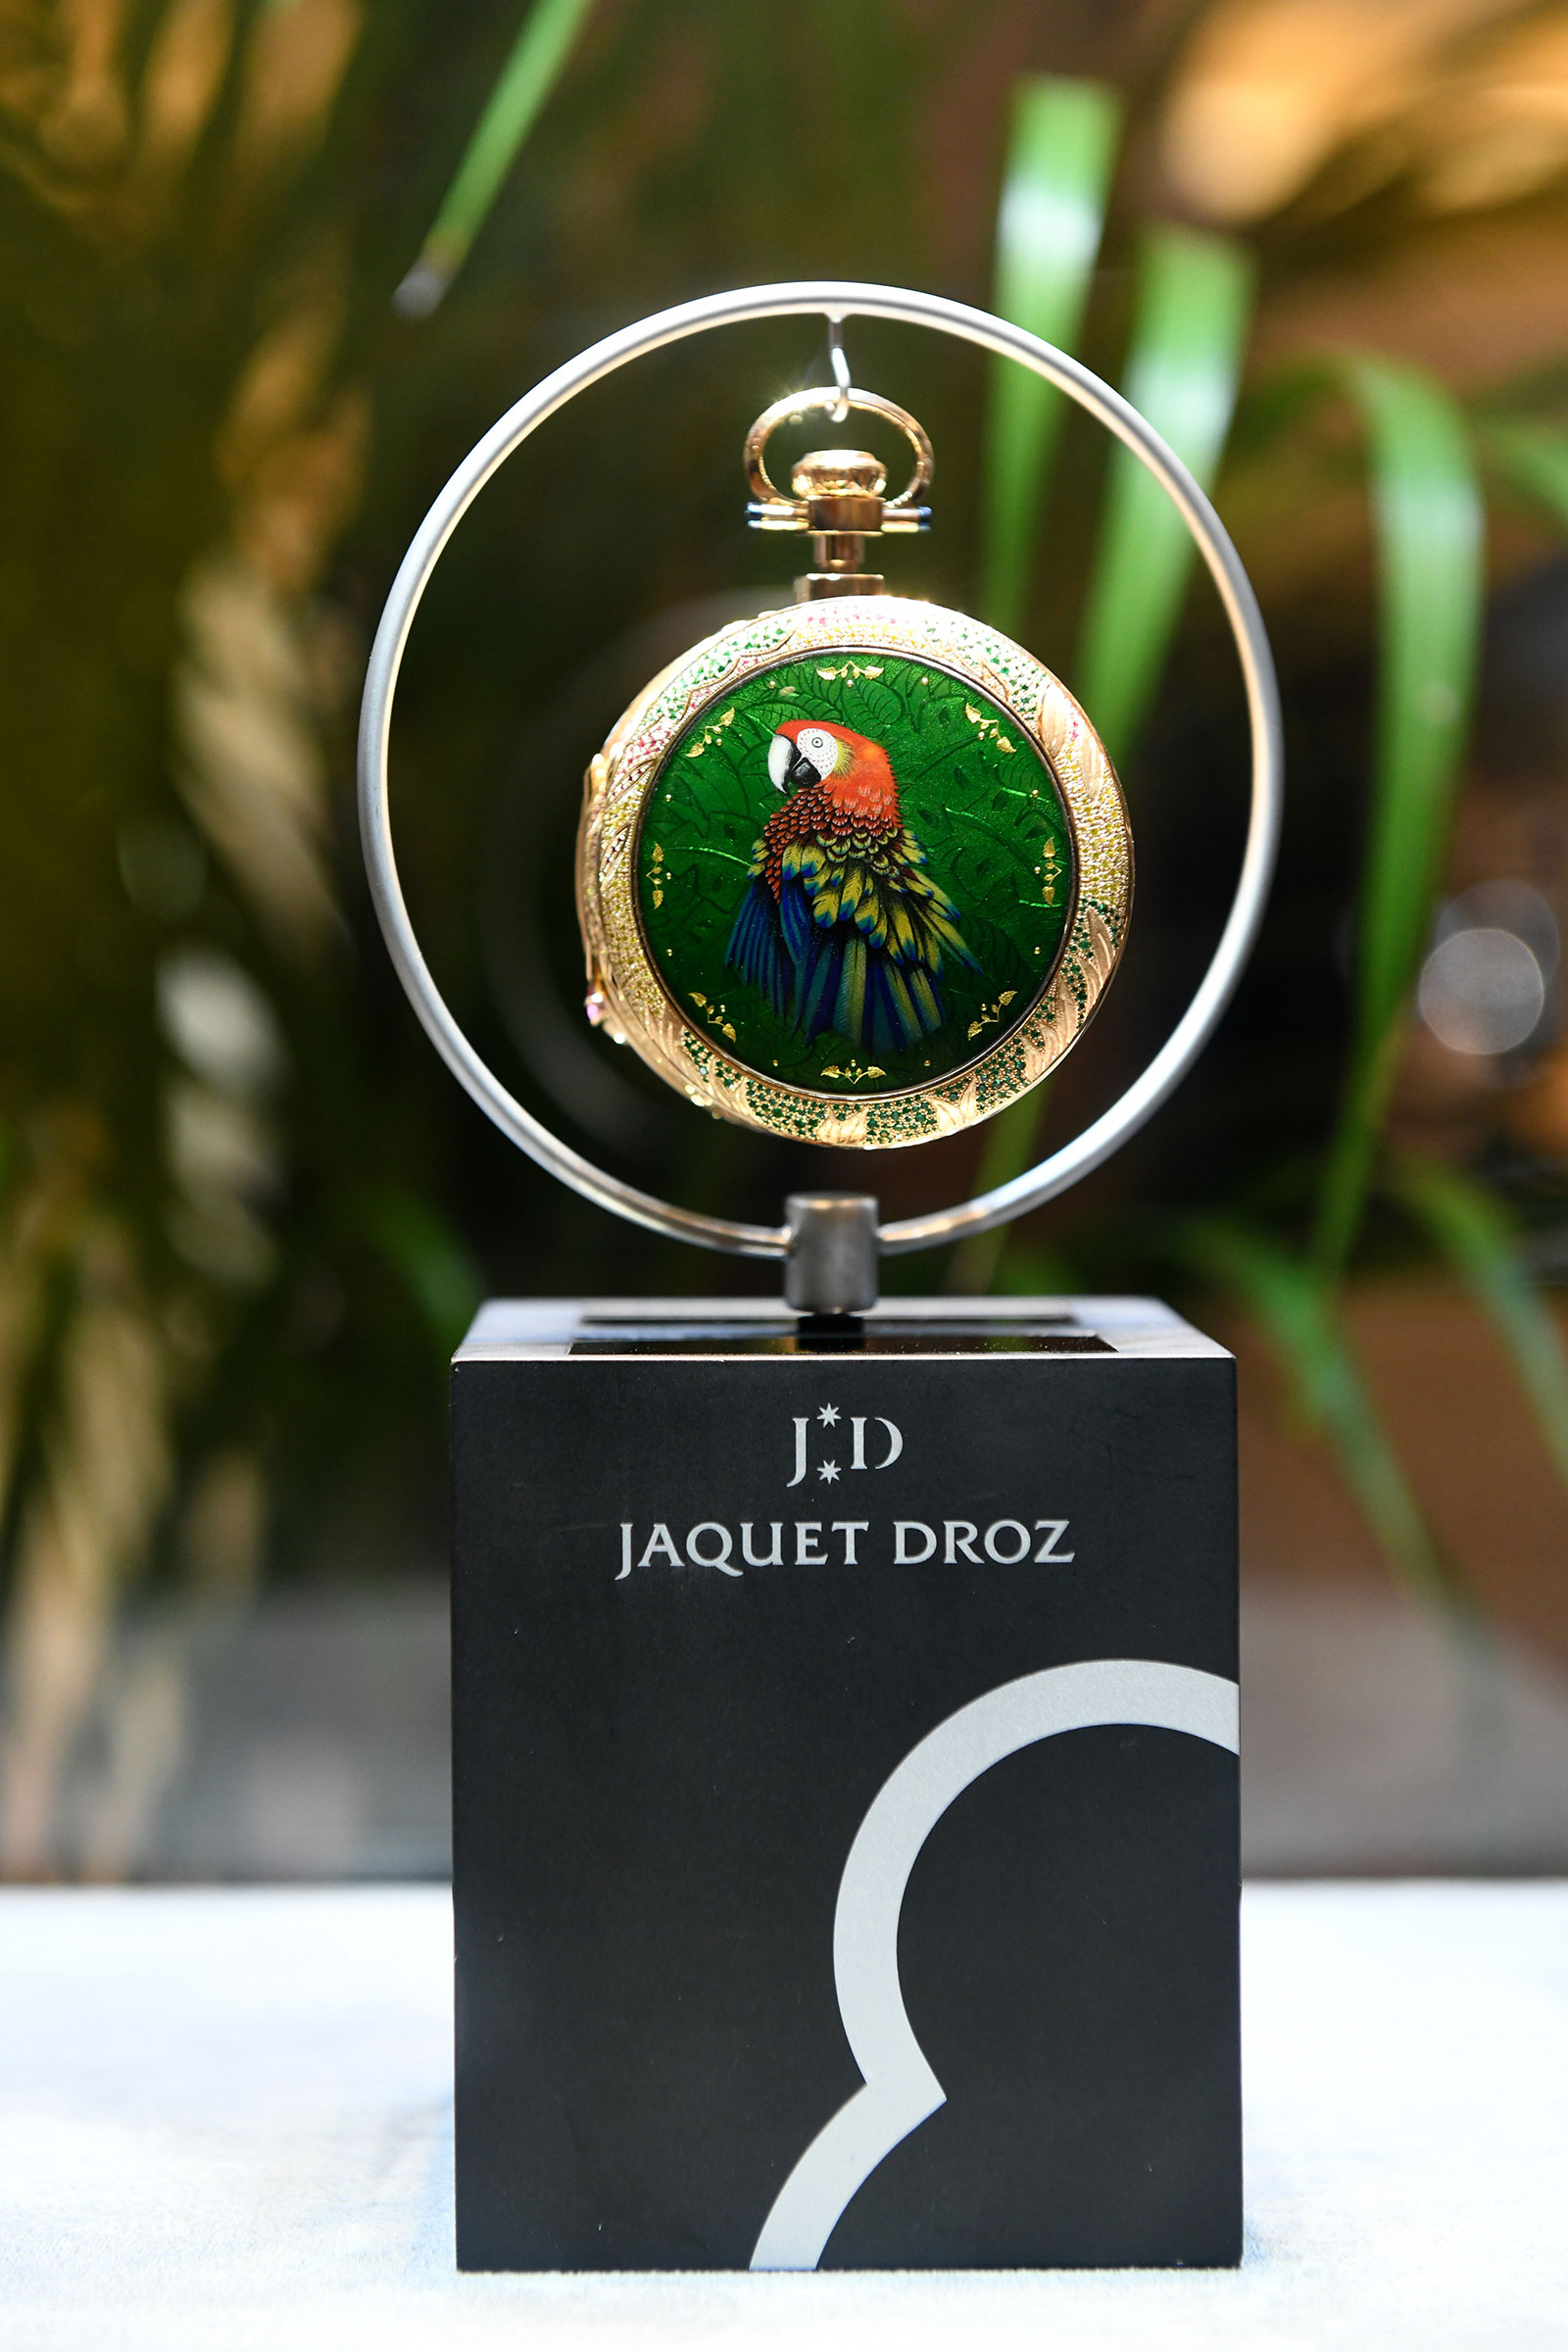 Jaquet Droz Parrot Repeater Watch Singapore 2